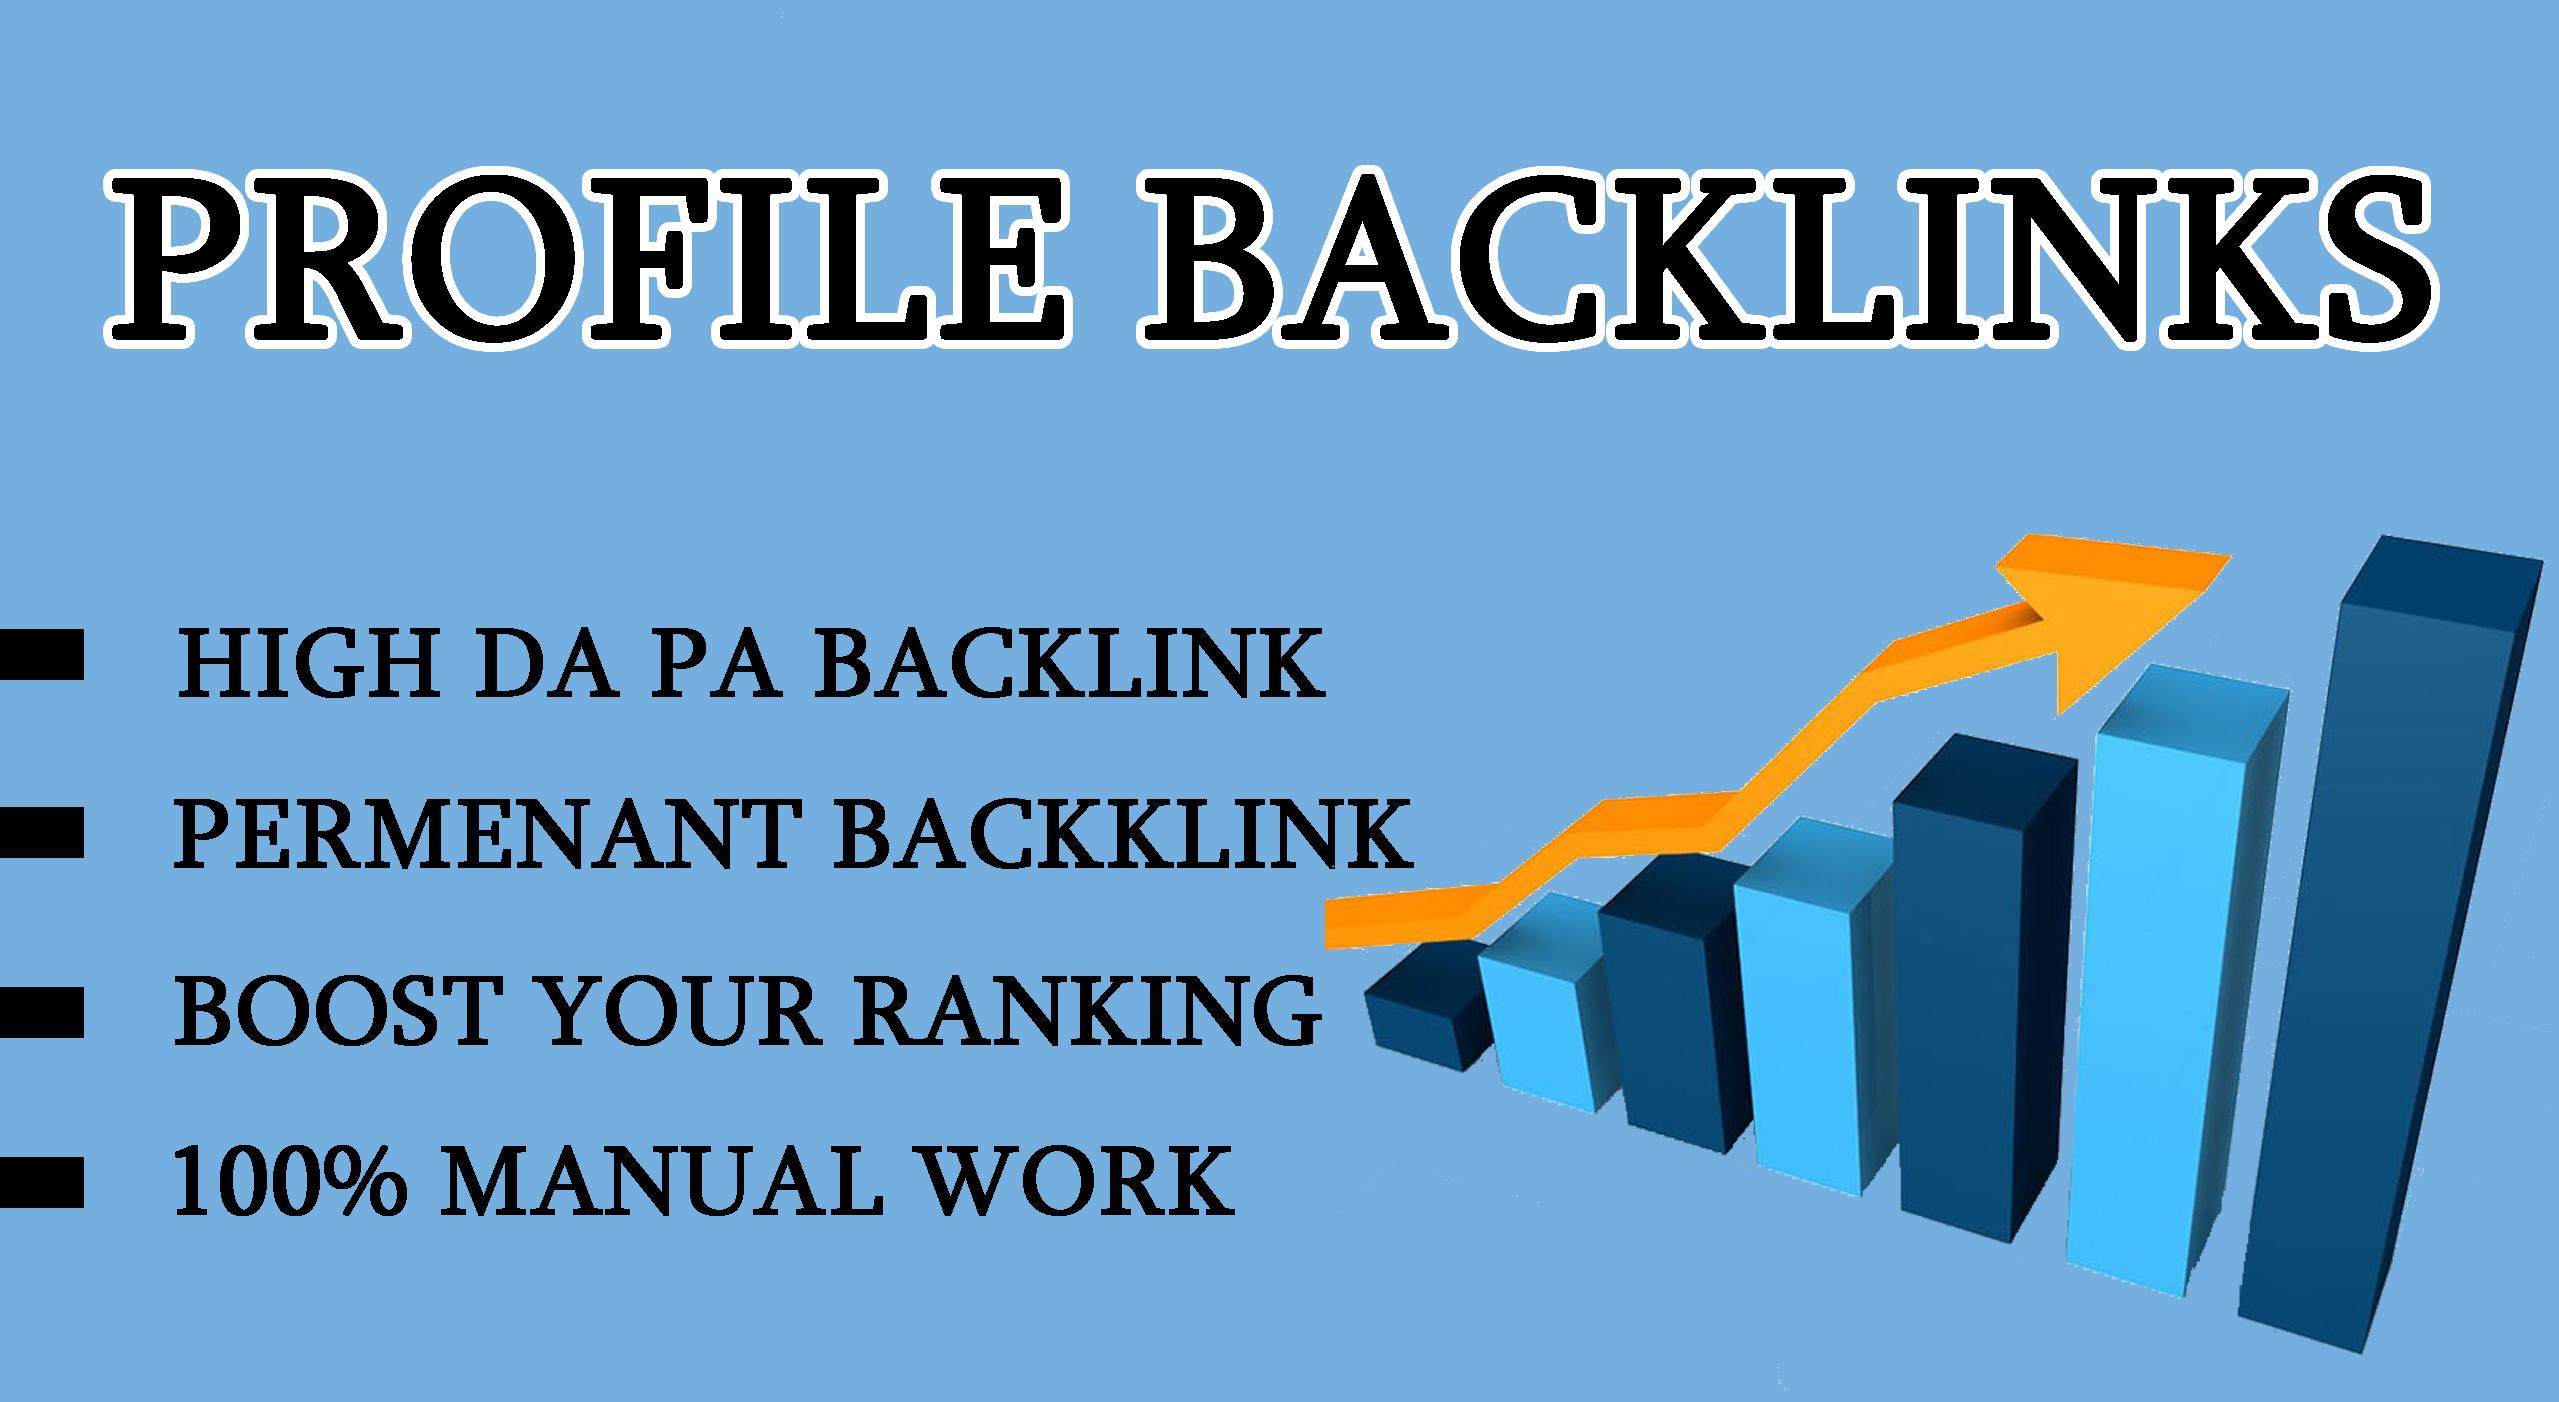 I will provide 30 profile Backlinks on High DA PA